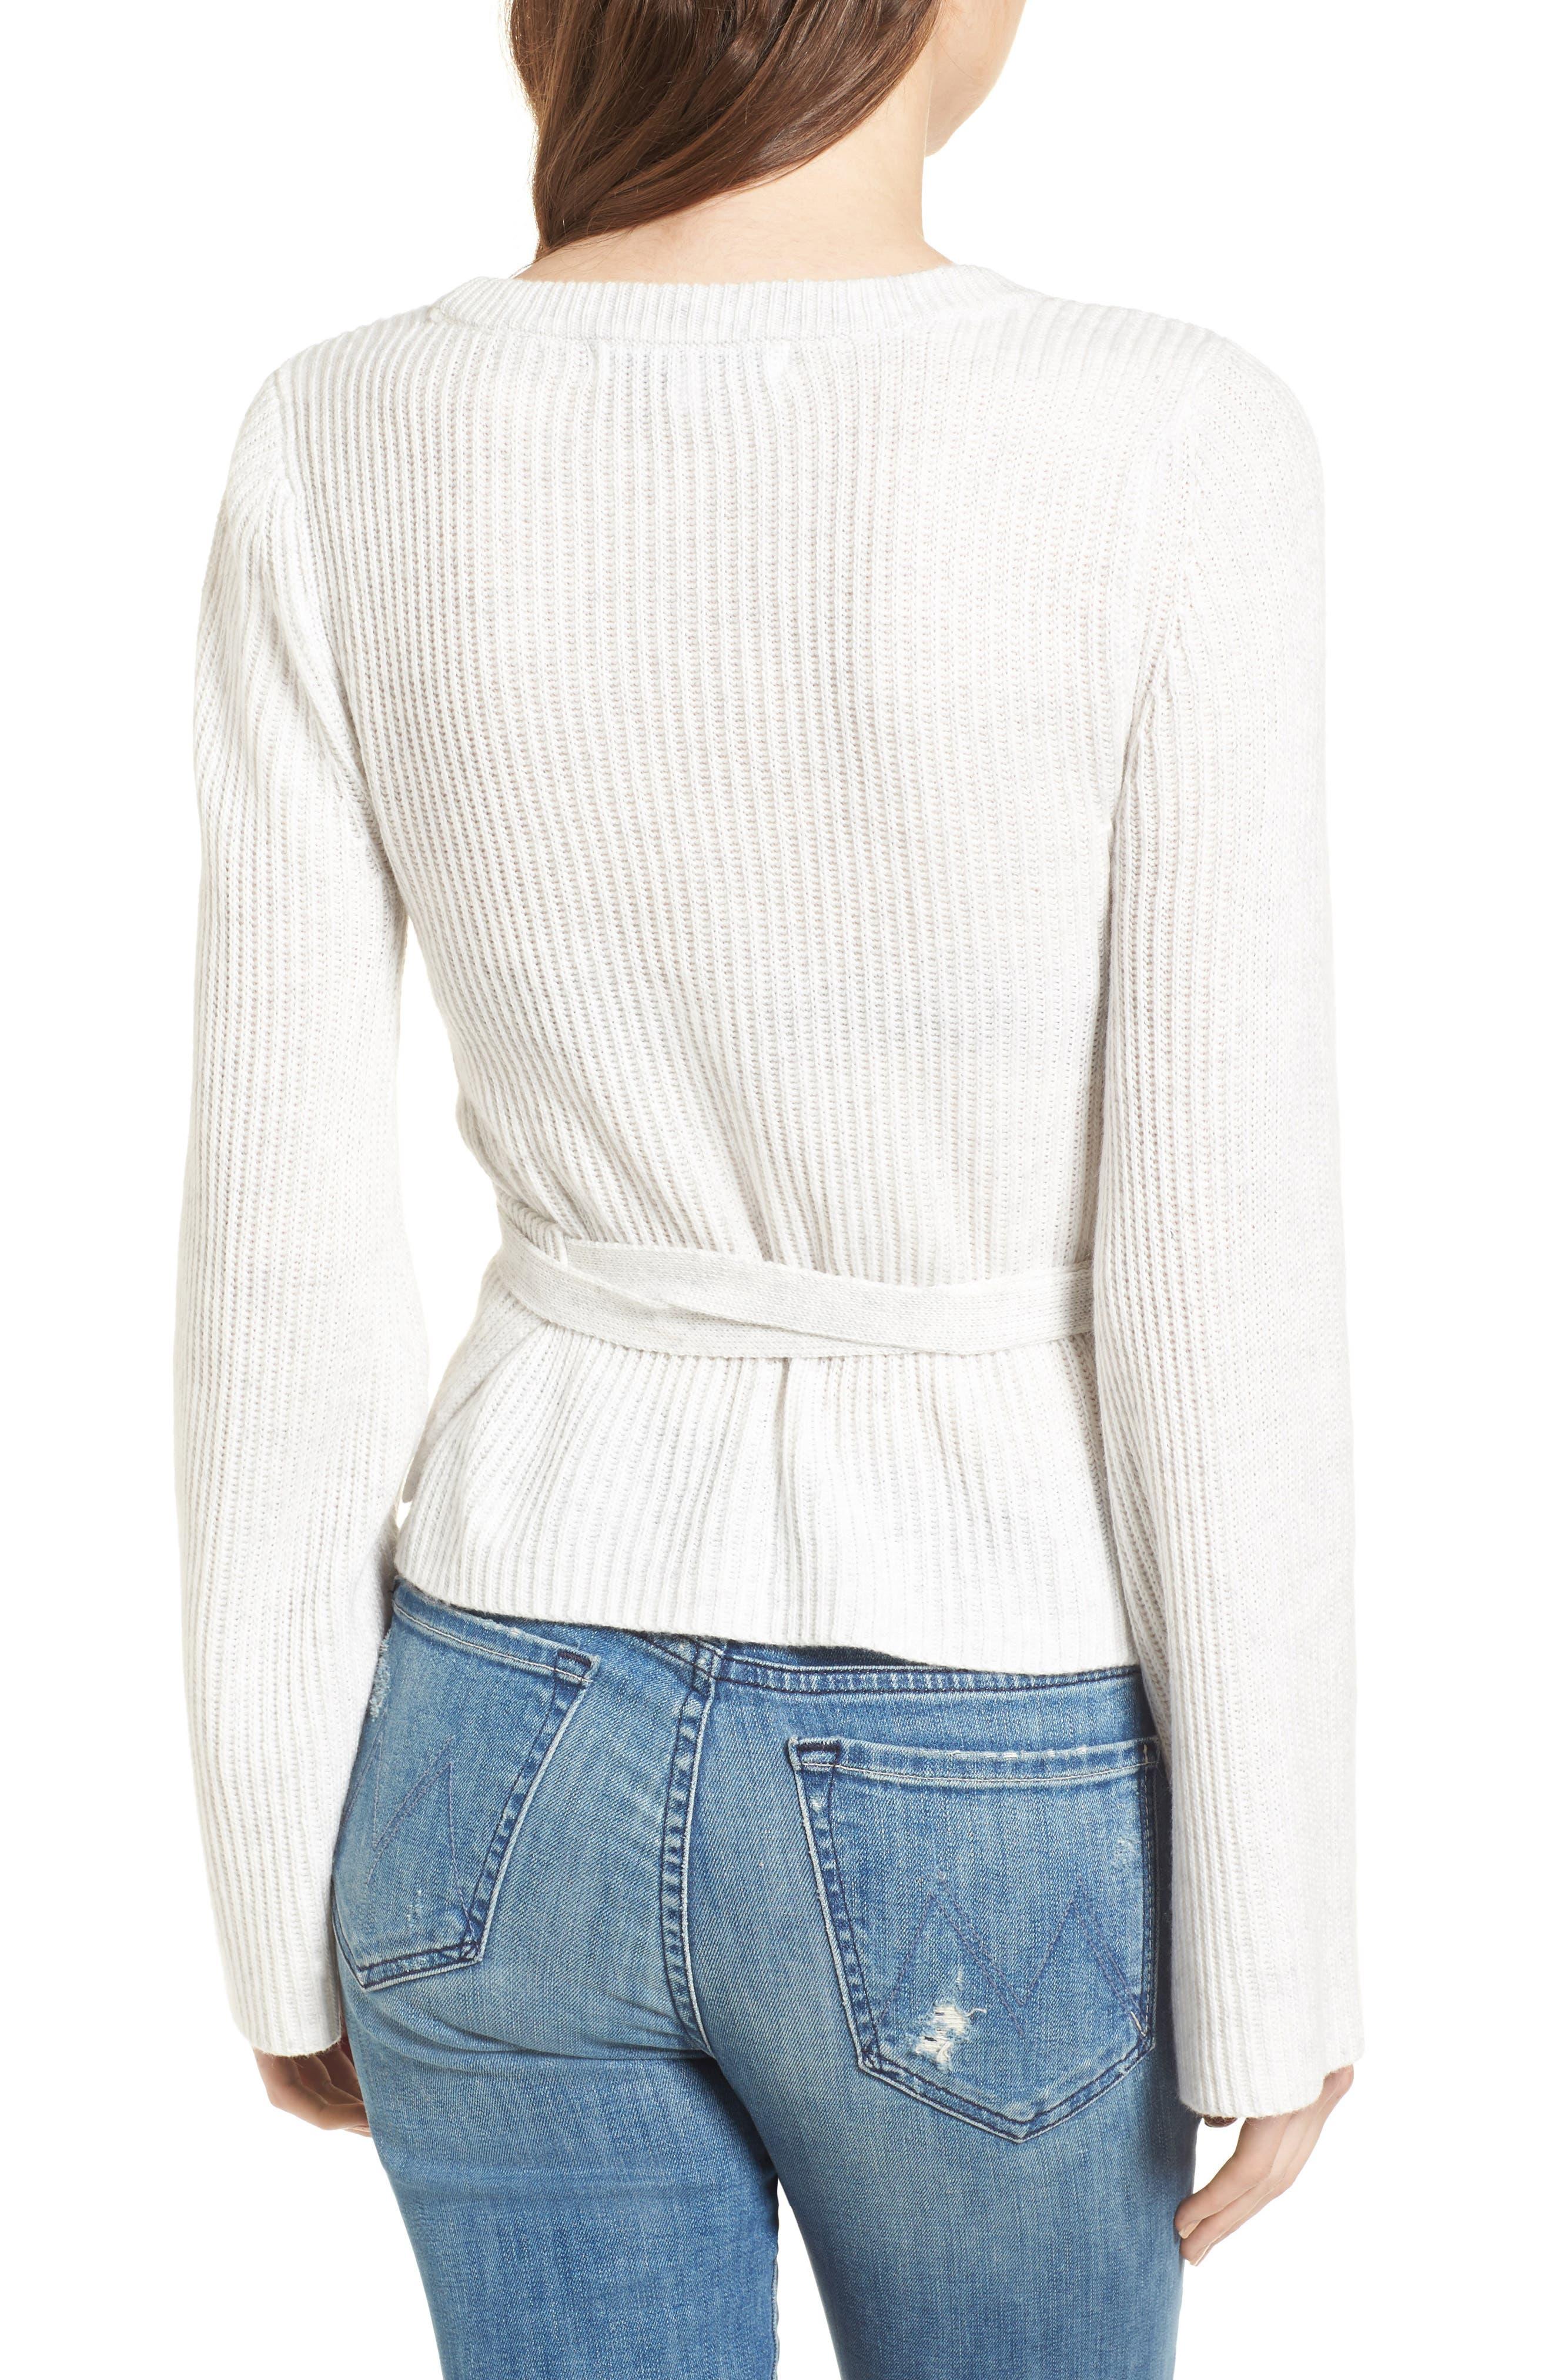 Chavi Tie Waist Sweater,                             Alternate thumbnail 2, color,                             Heather Ash